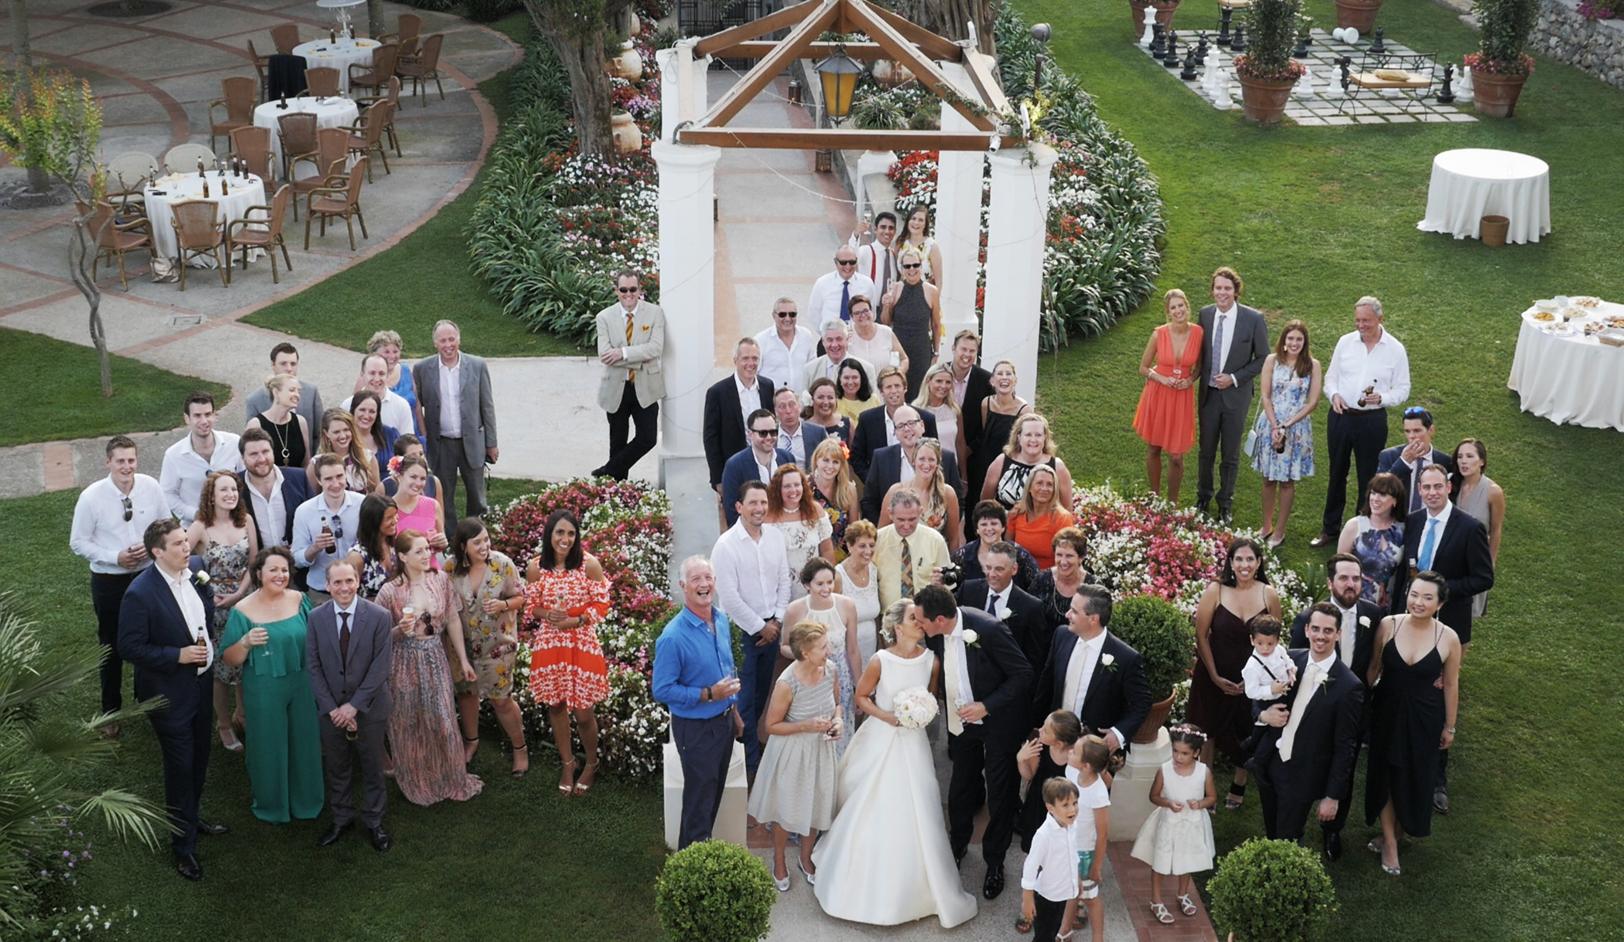 matrimonio-a-villa-eva-ravello-amalfi-italia-villa-cimbrone.jpg